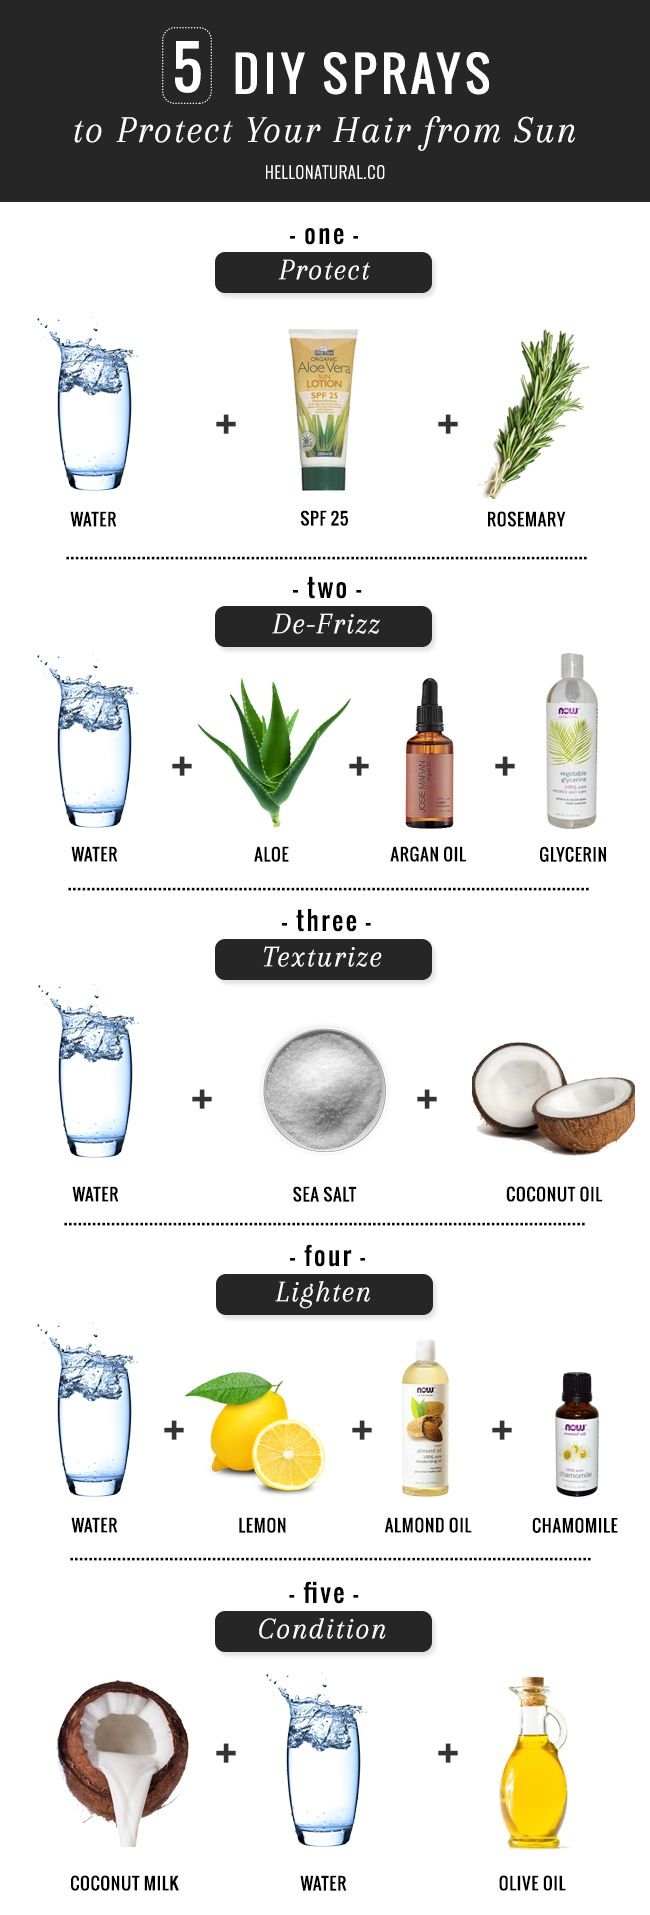 5 DIY Maneras de proteger el cabello del sol, humedad, calor | http://hellonatural.co/how-to-protect-your-hair-from-sun-heat-humidity-with-diy-sprays/ #cabello #tips #proteccion #natural